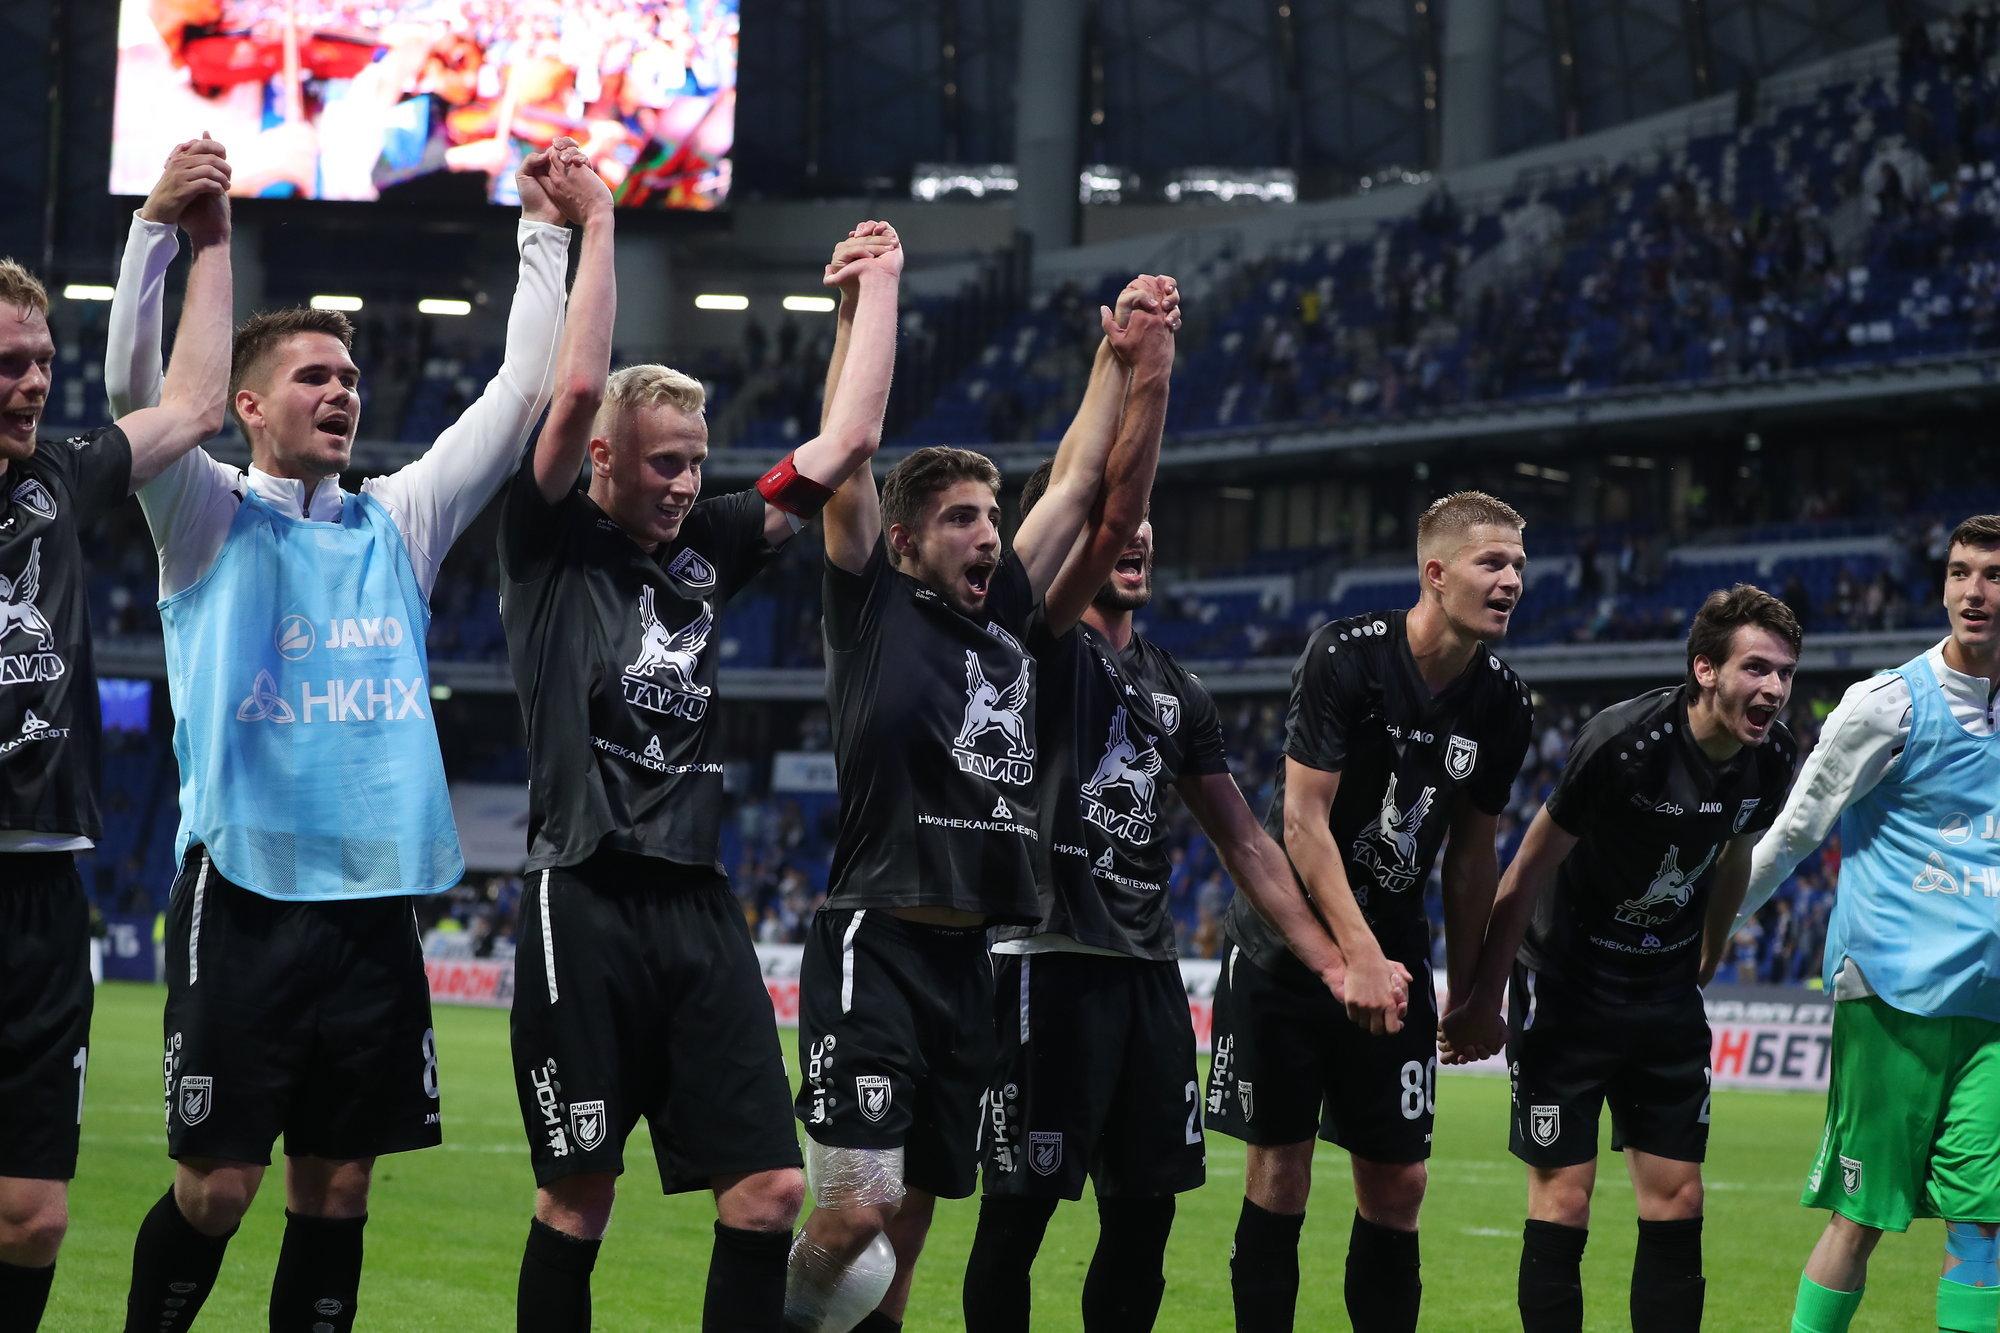 «Рубин» Шаронова победил вКазани «Арсенал»— Рок-н-ролл живой